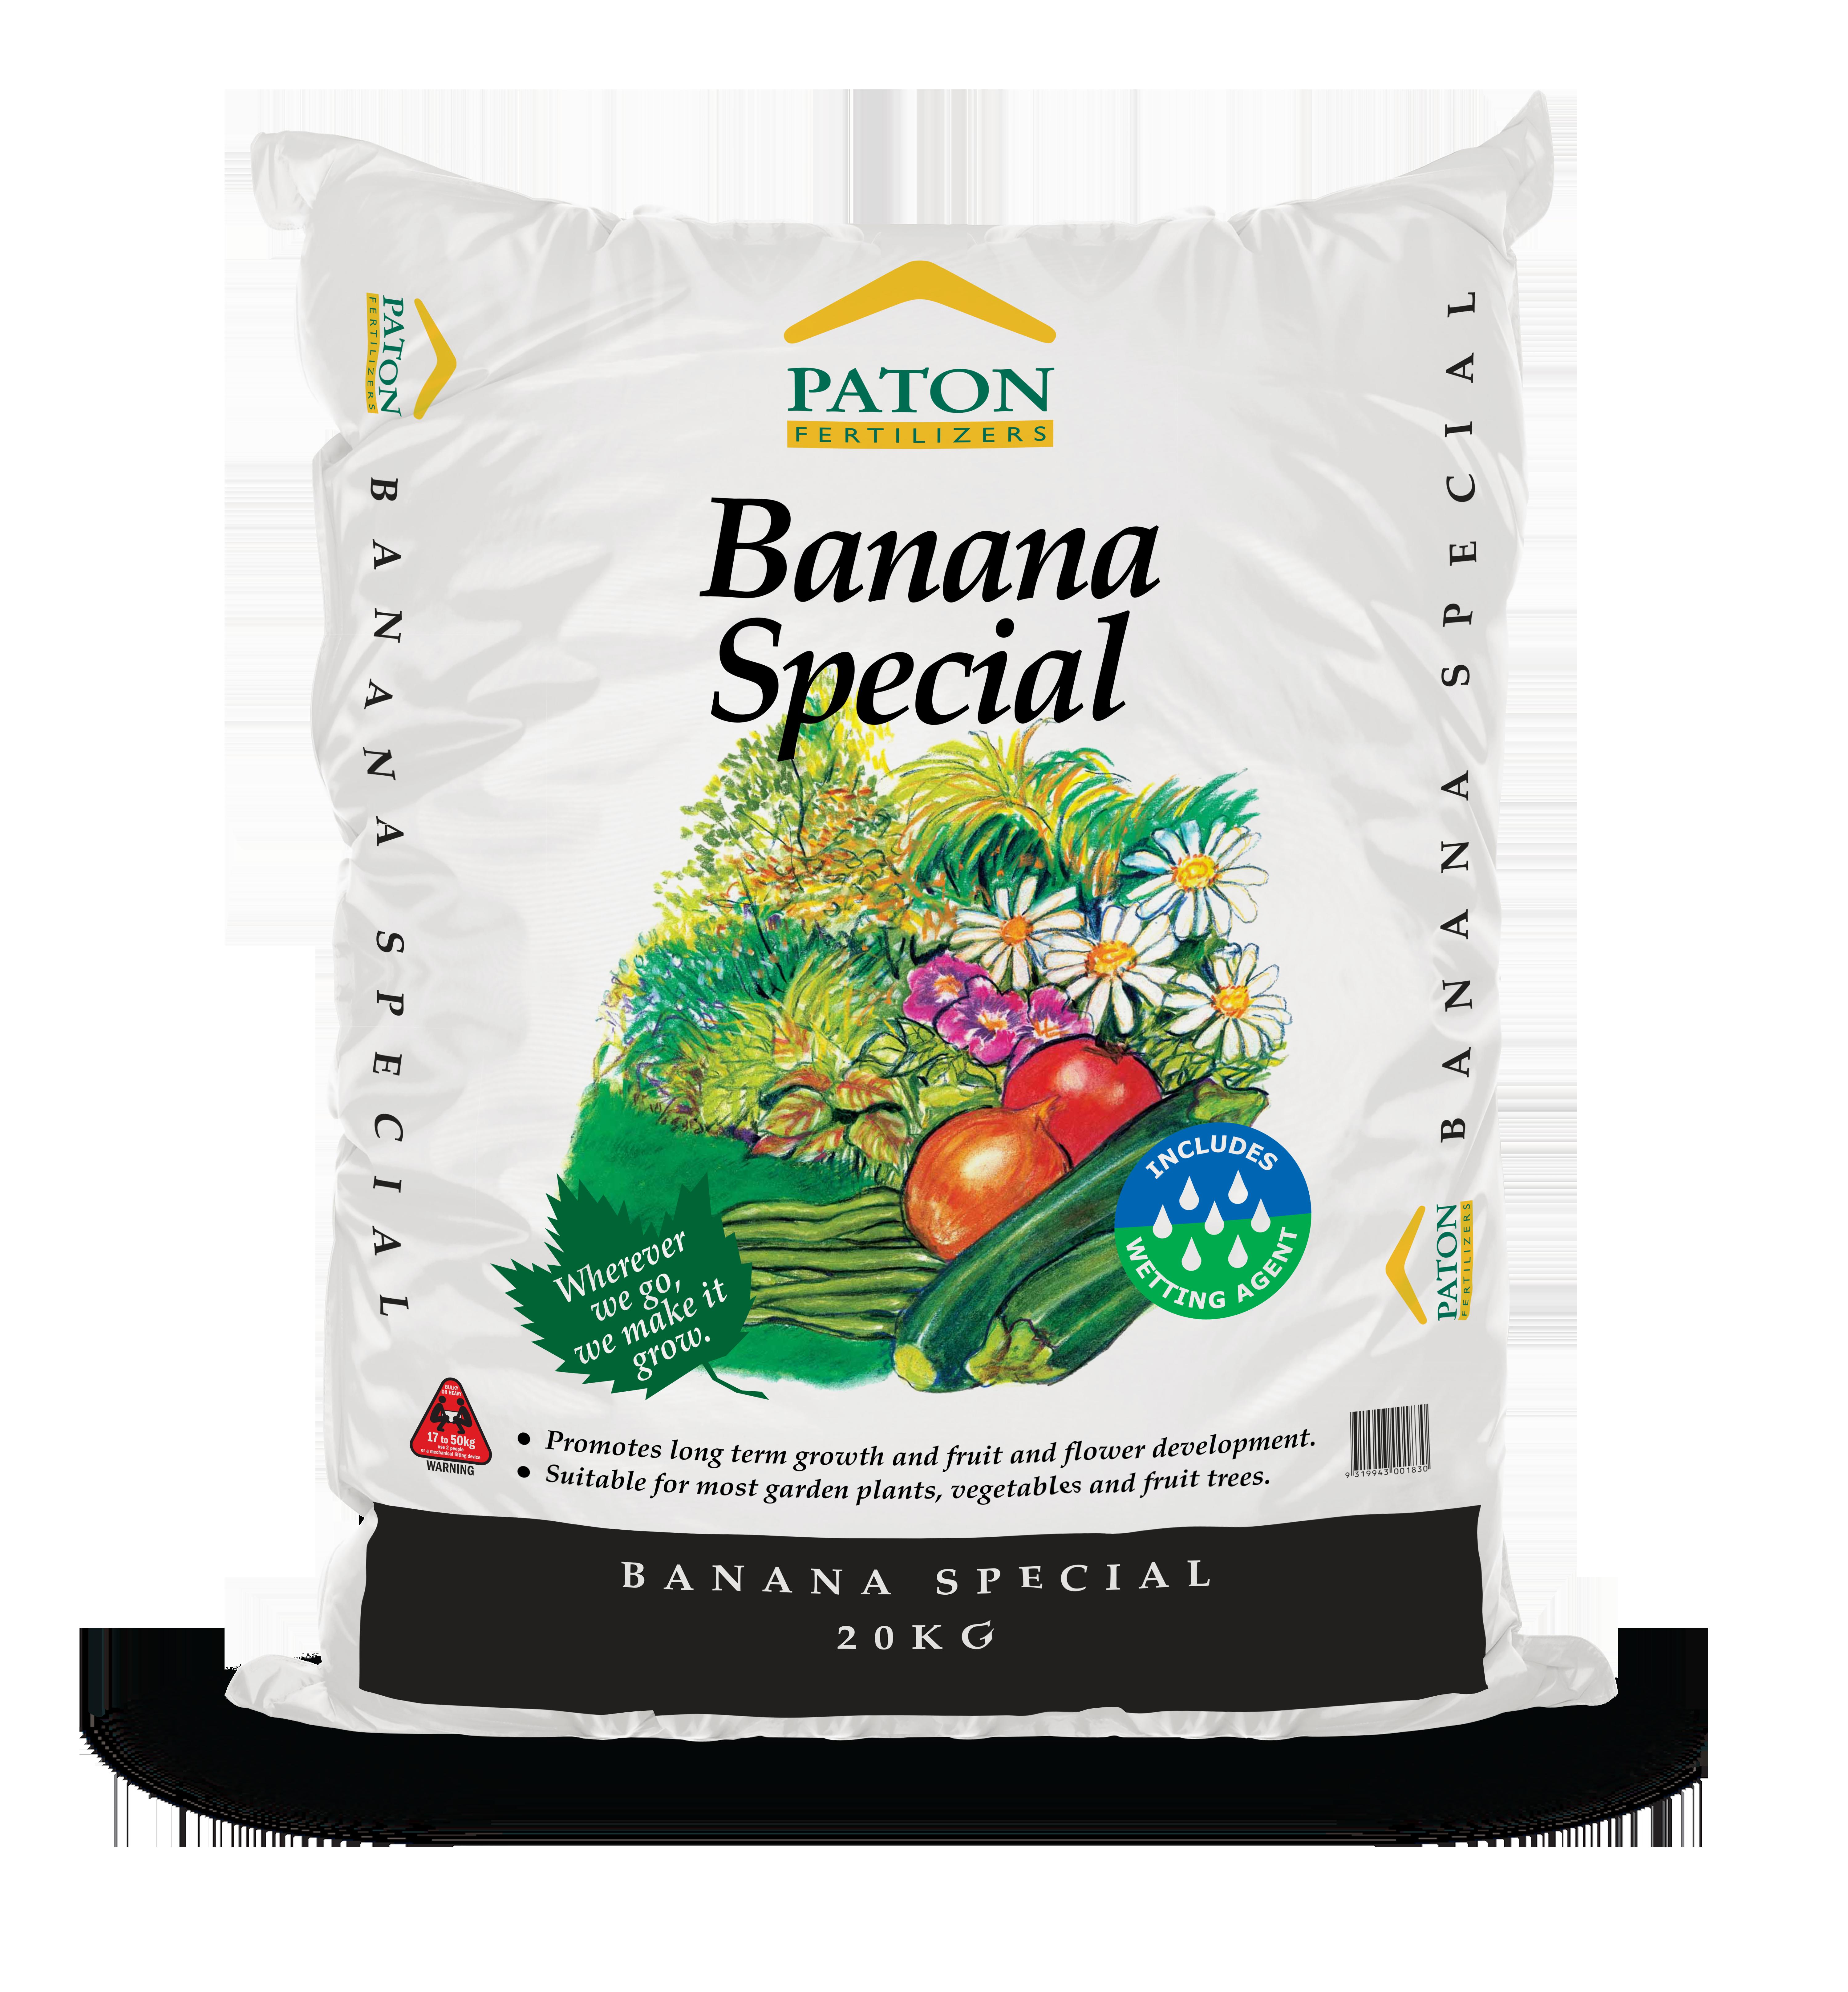 Patons_Banana-Special